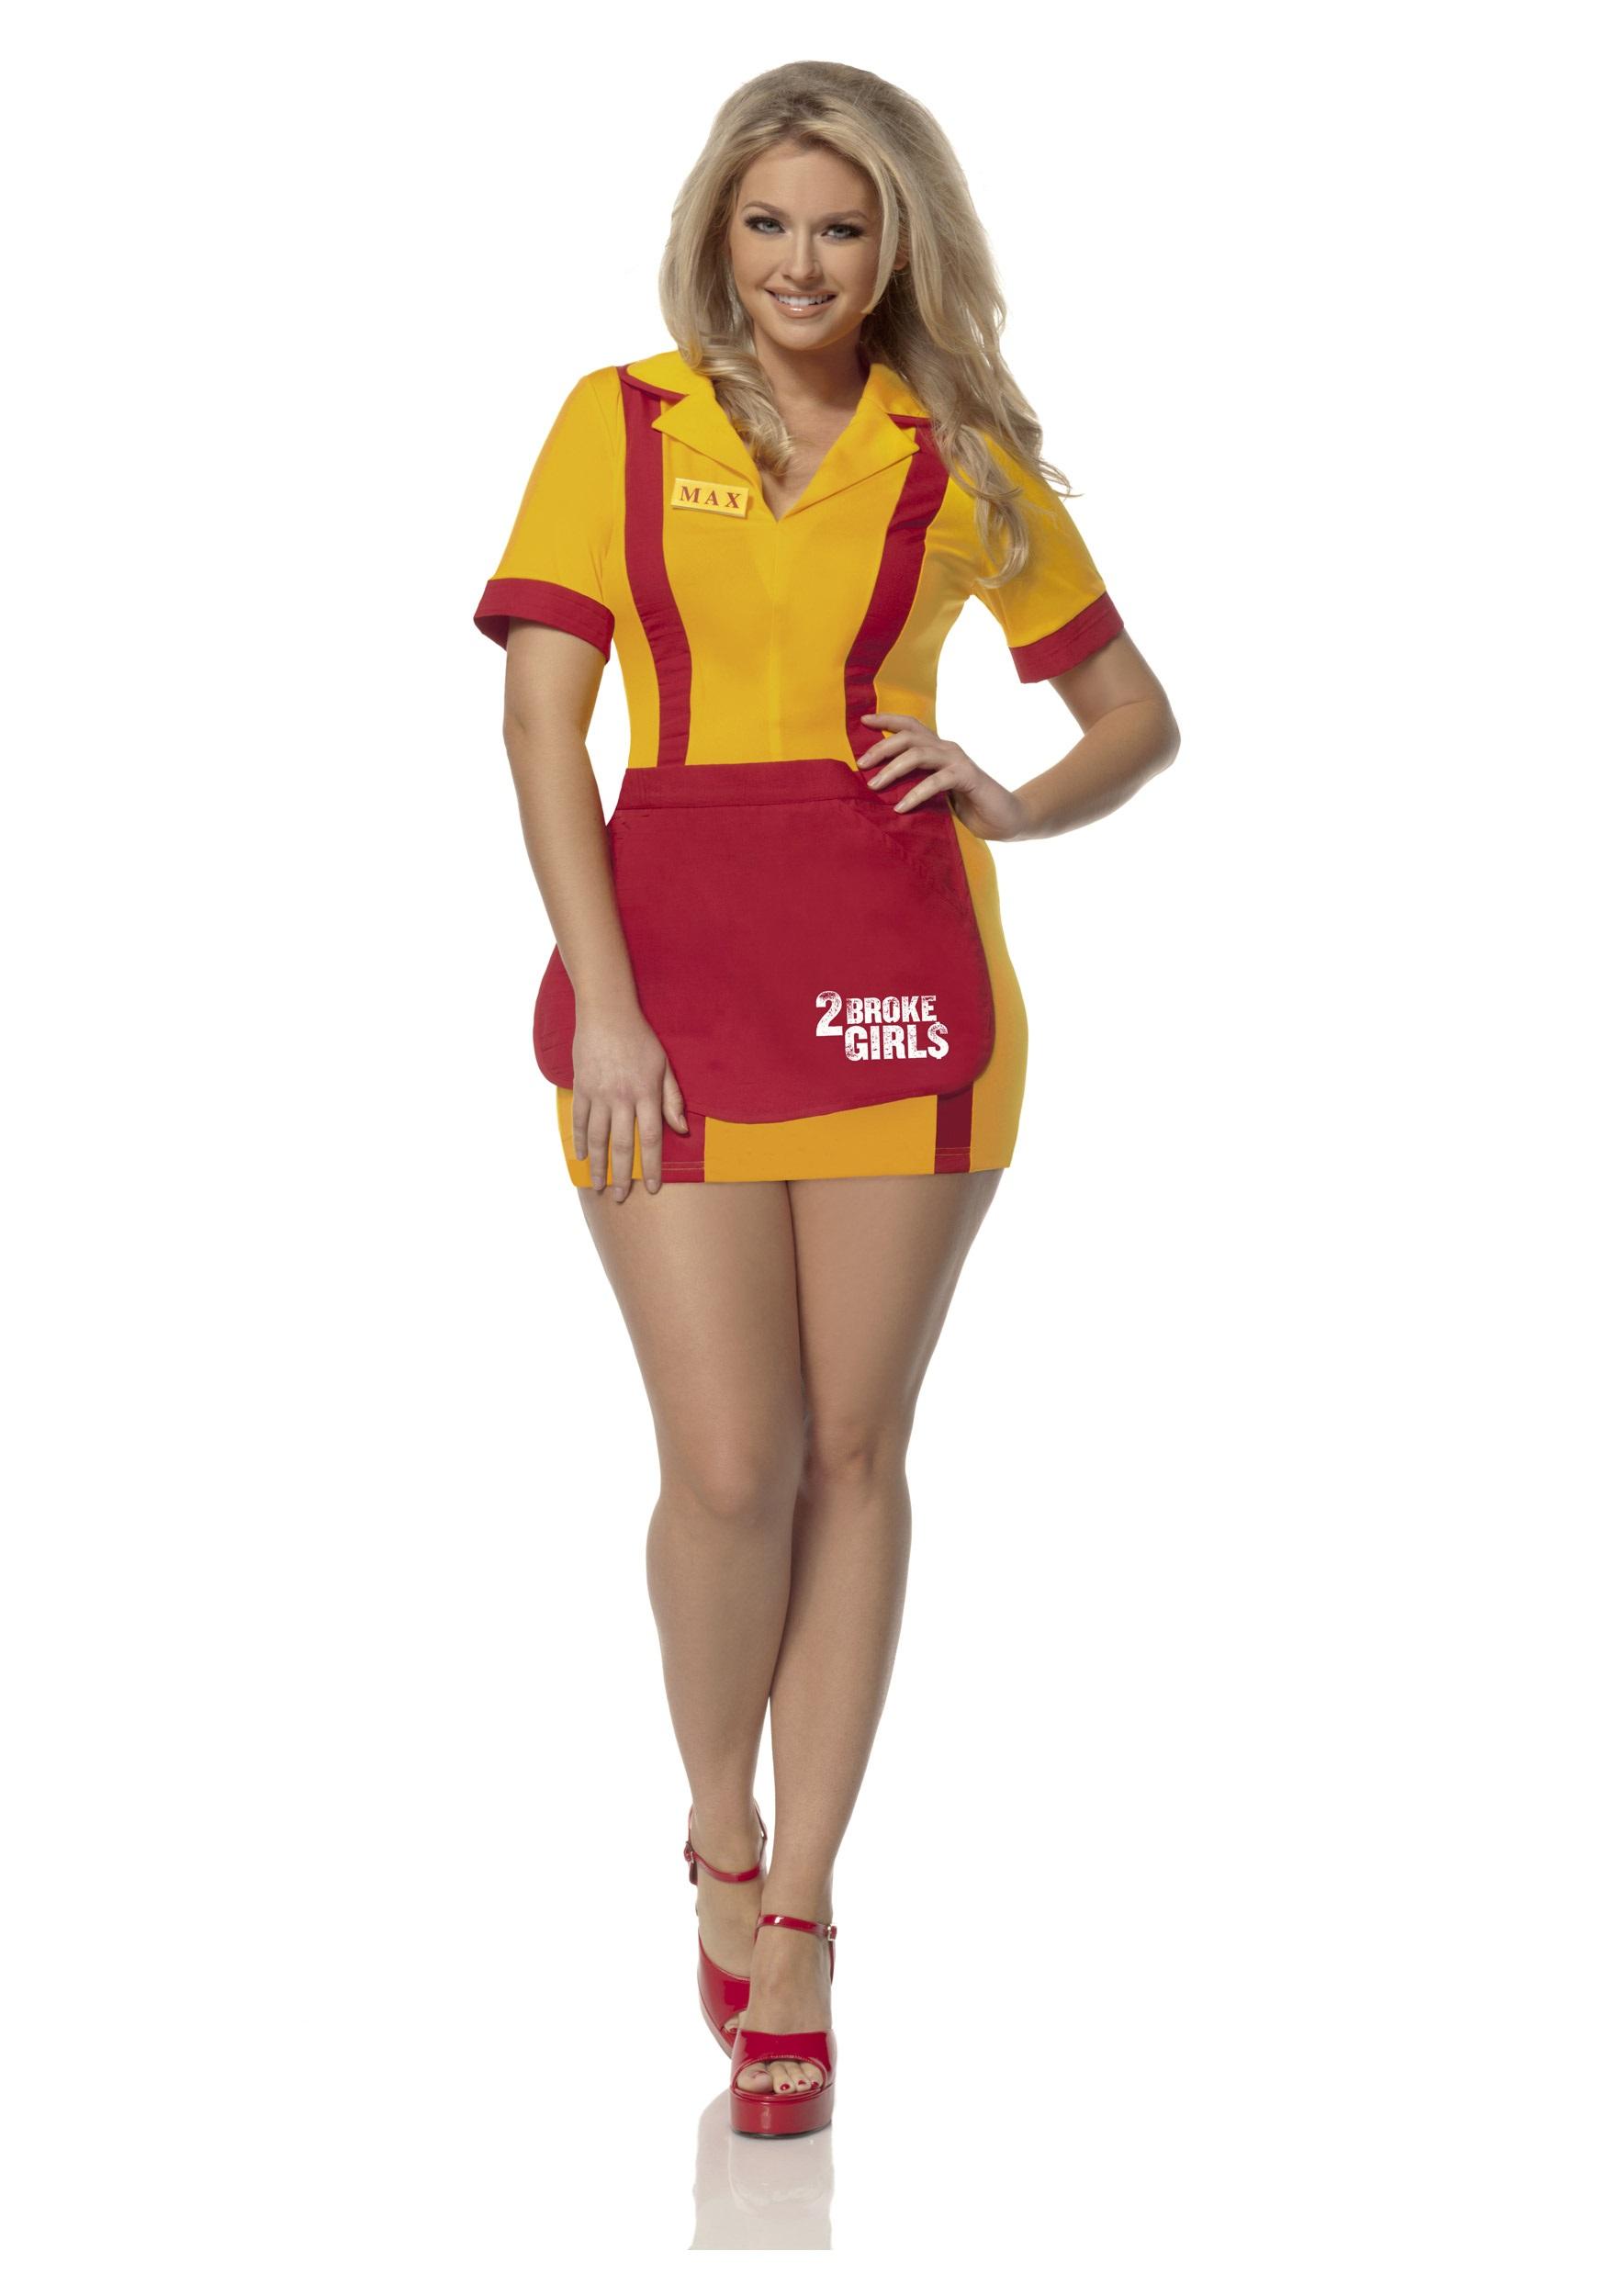 plus-size-2-broke-girls-waitress-costume.jpg